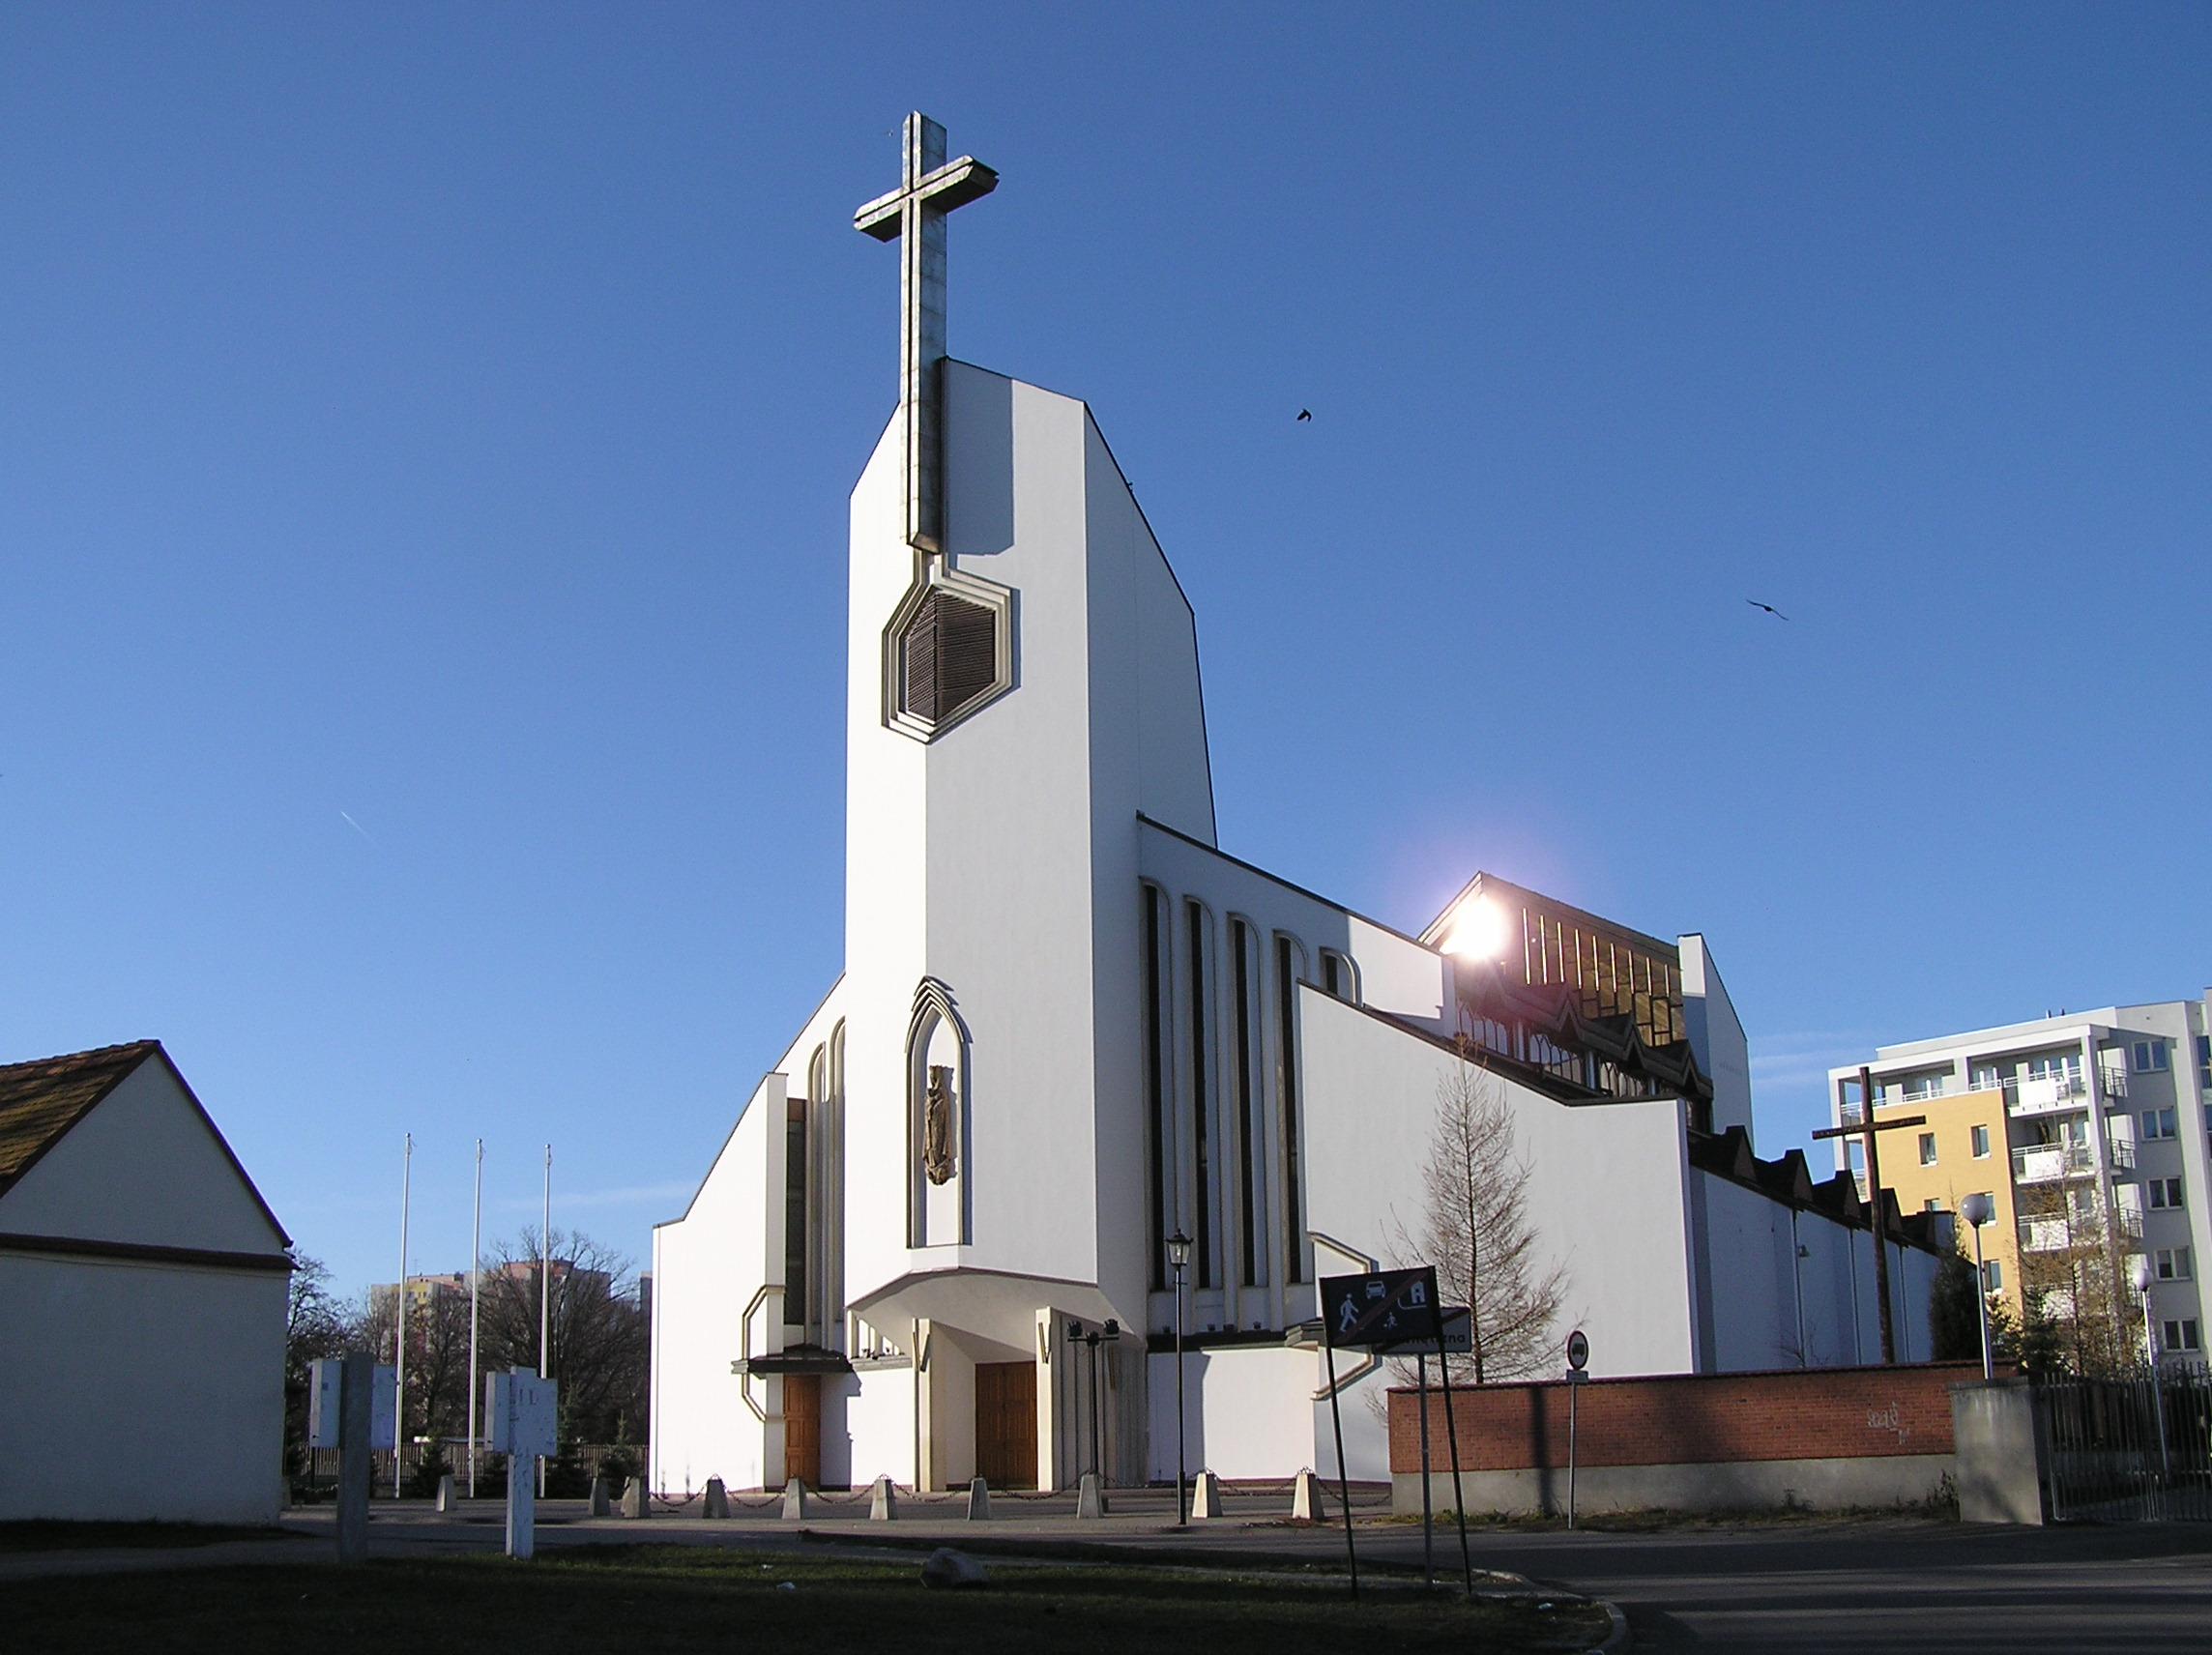 Churches cost US taxpayers $71 billion each year | Matthew